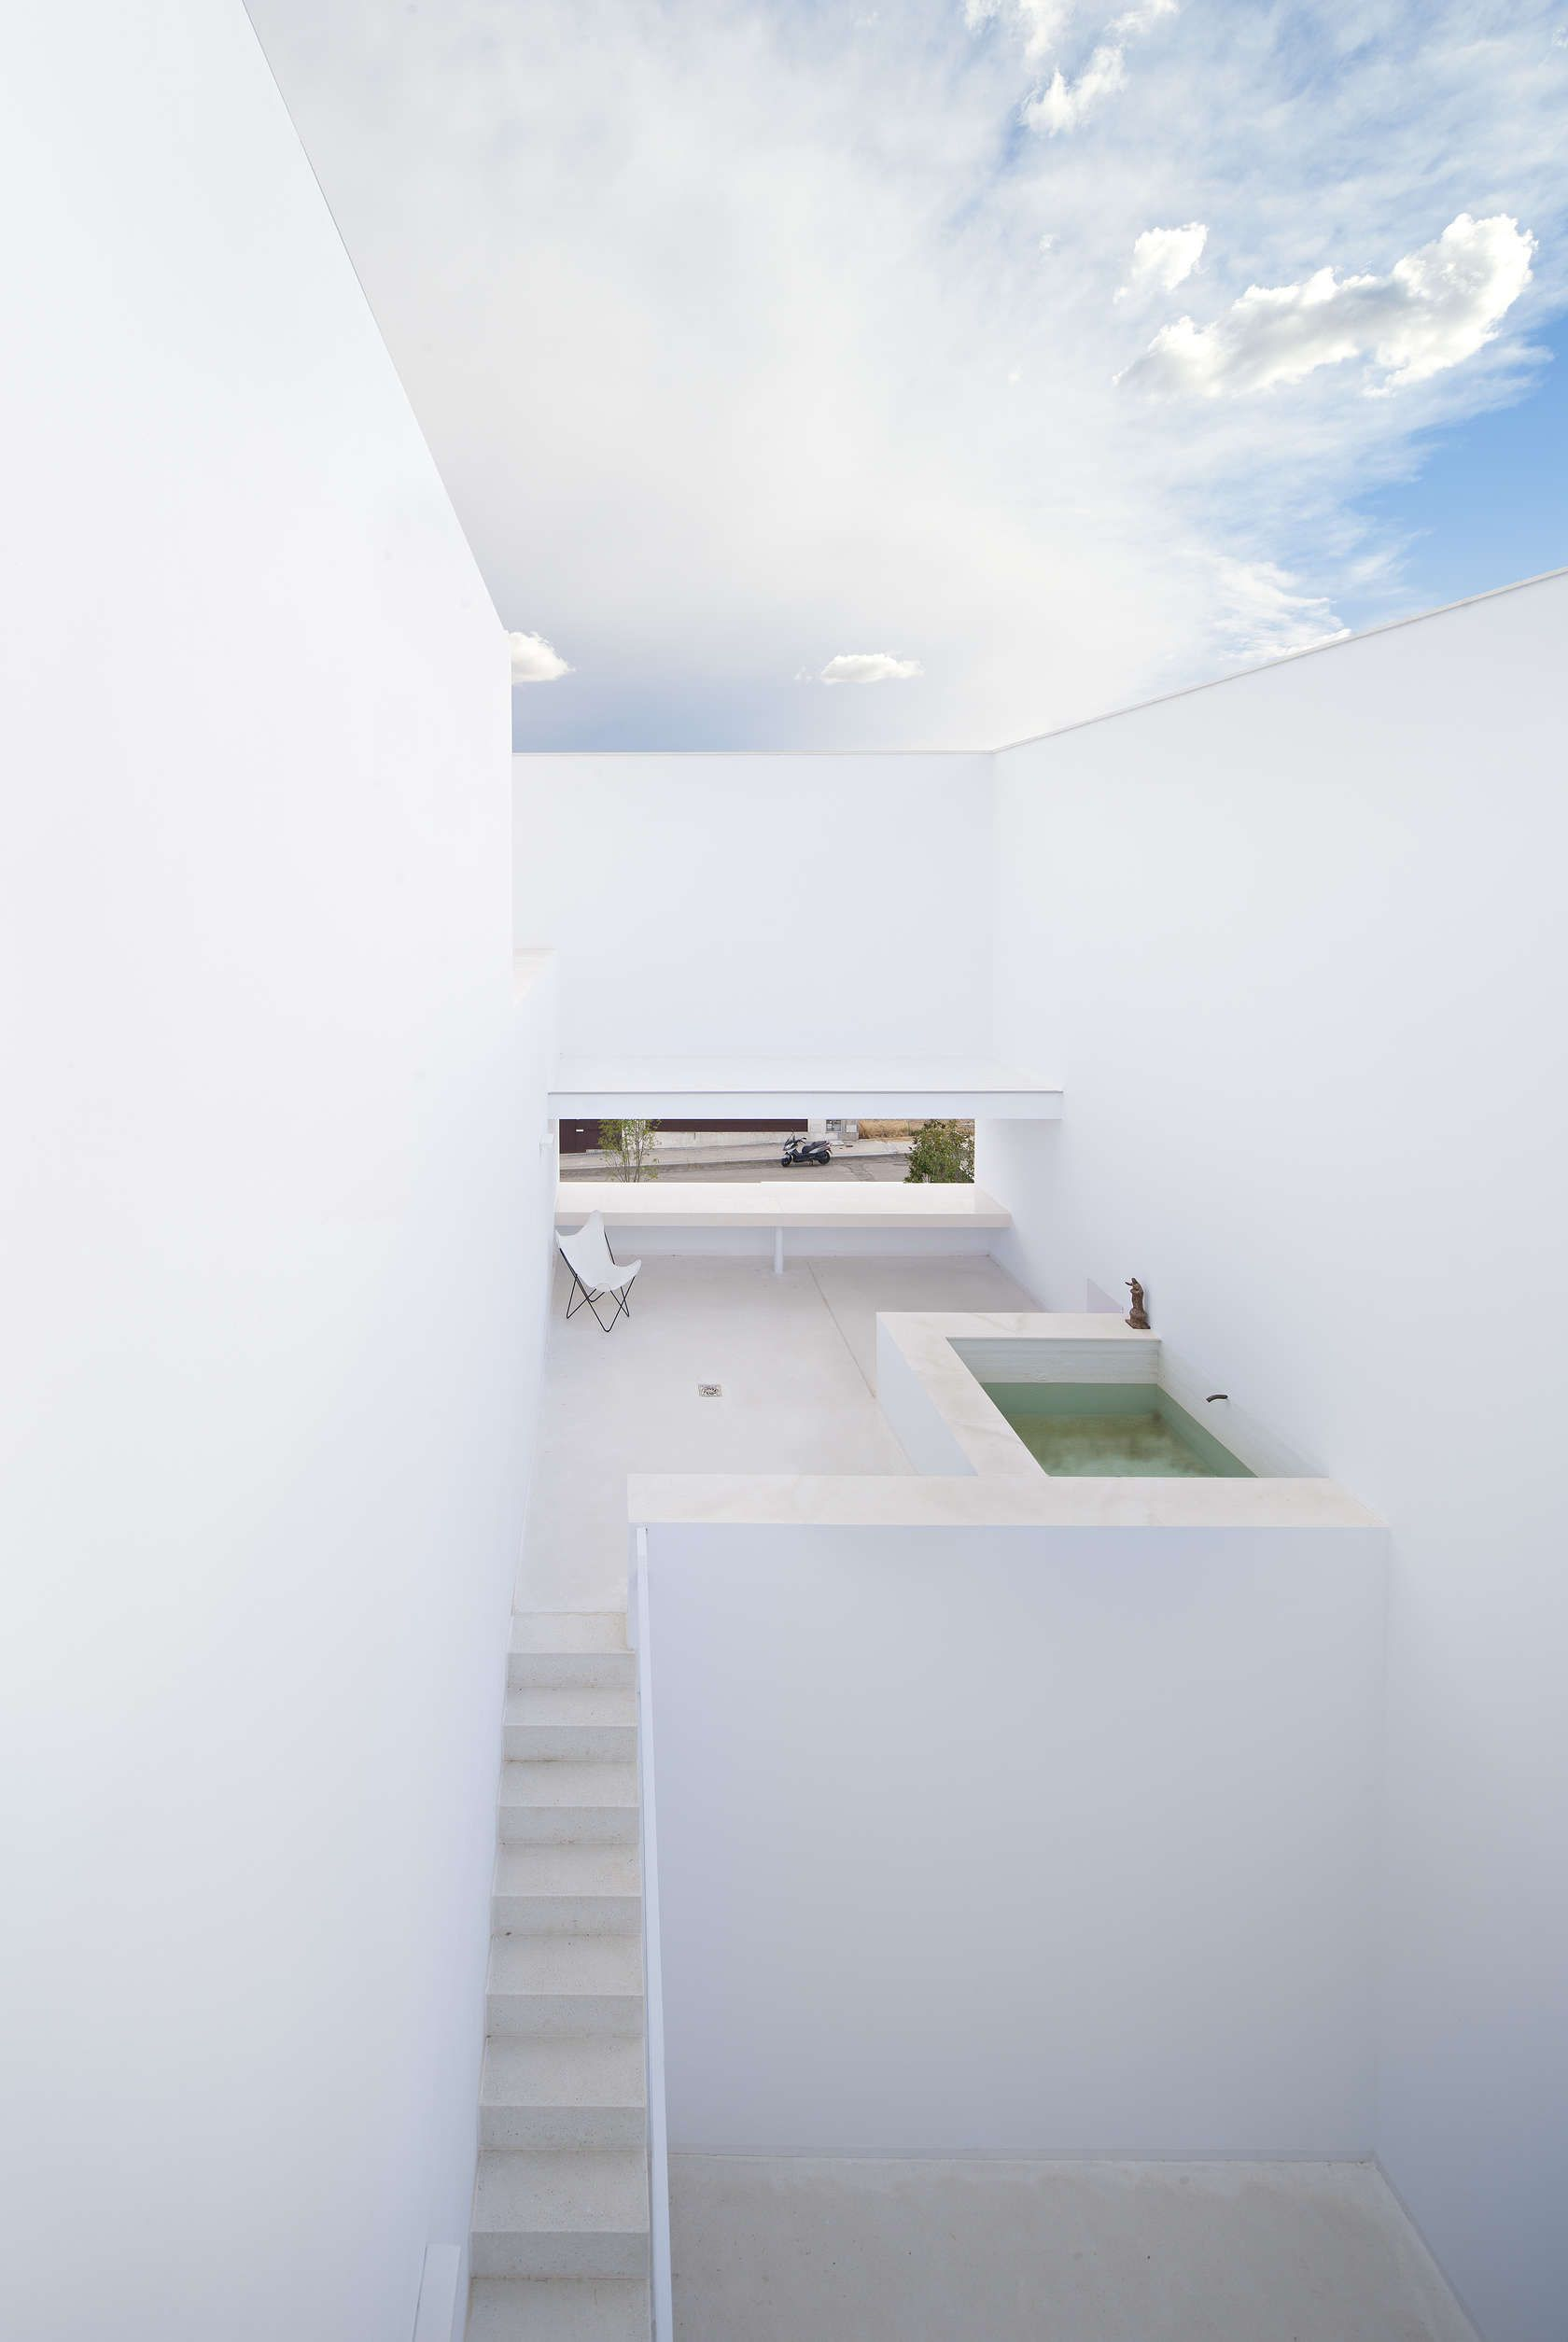 Gallery of Raumplan House Alberto Campo Baeza 8